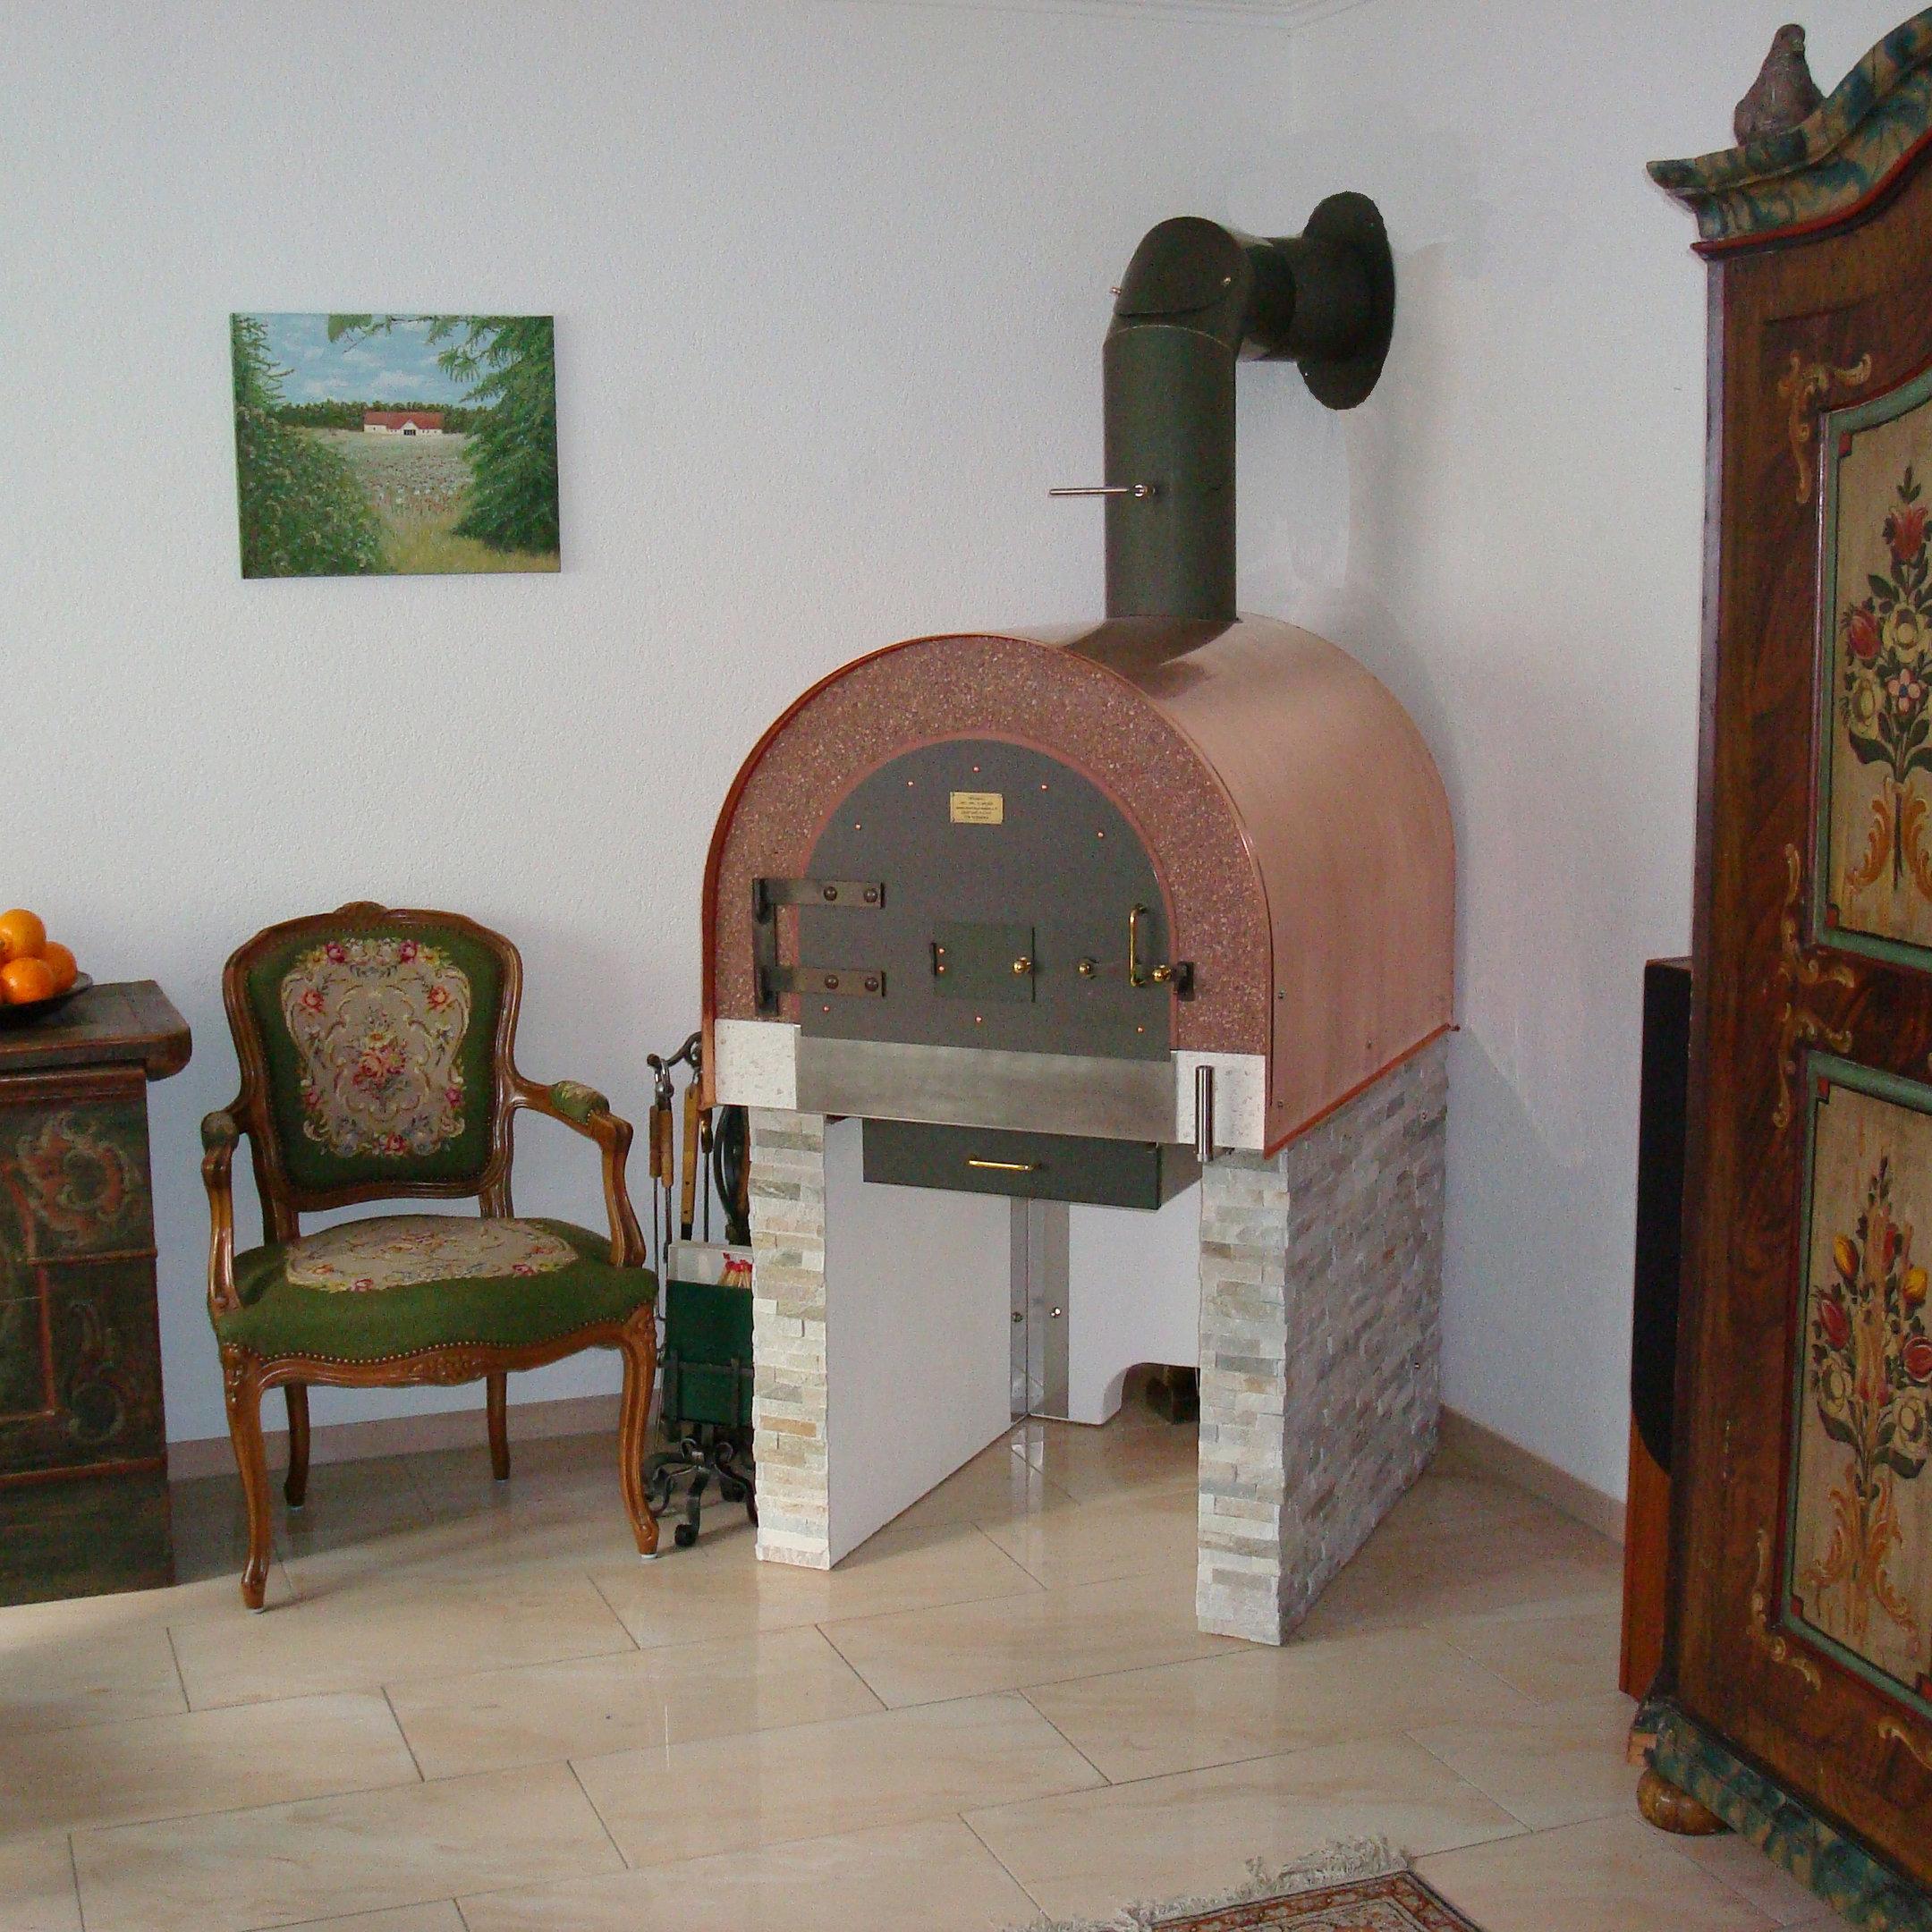 Pizzaofen.ch